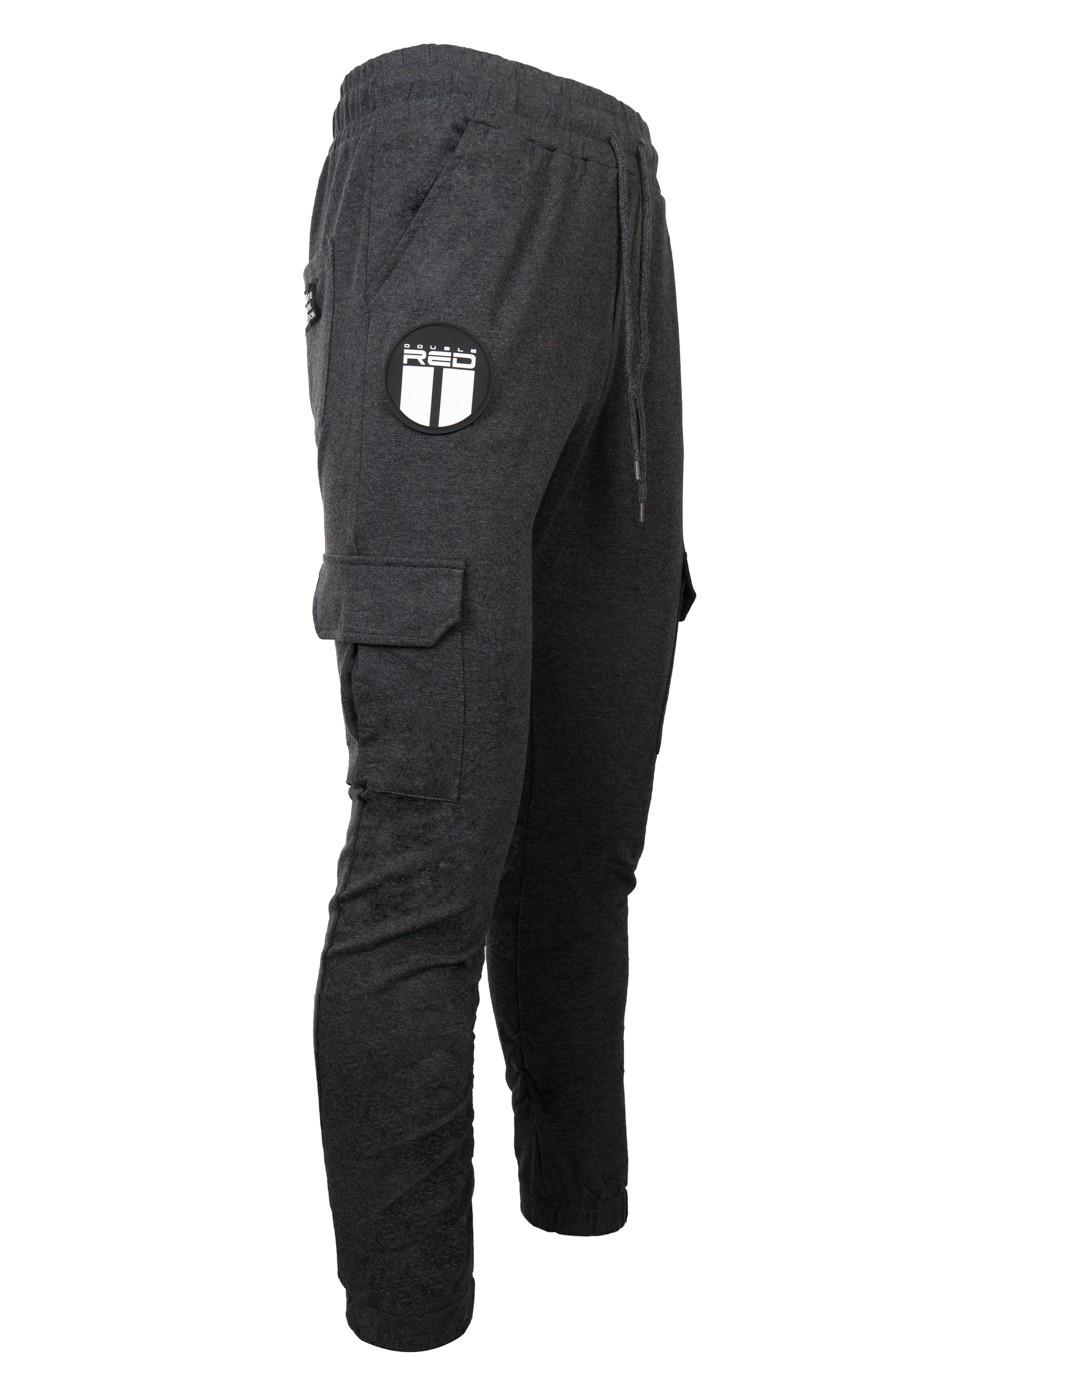 Sweatpants ARMADEN Side Pocket Limited BW Edition